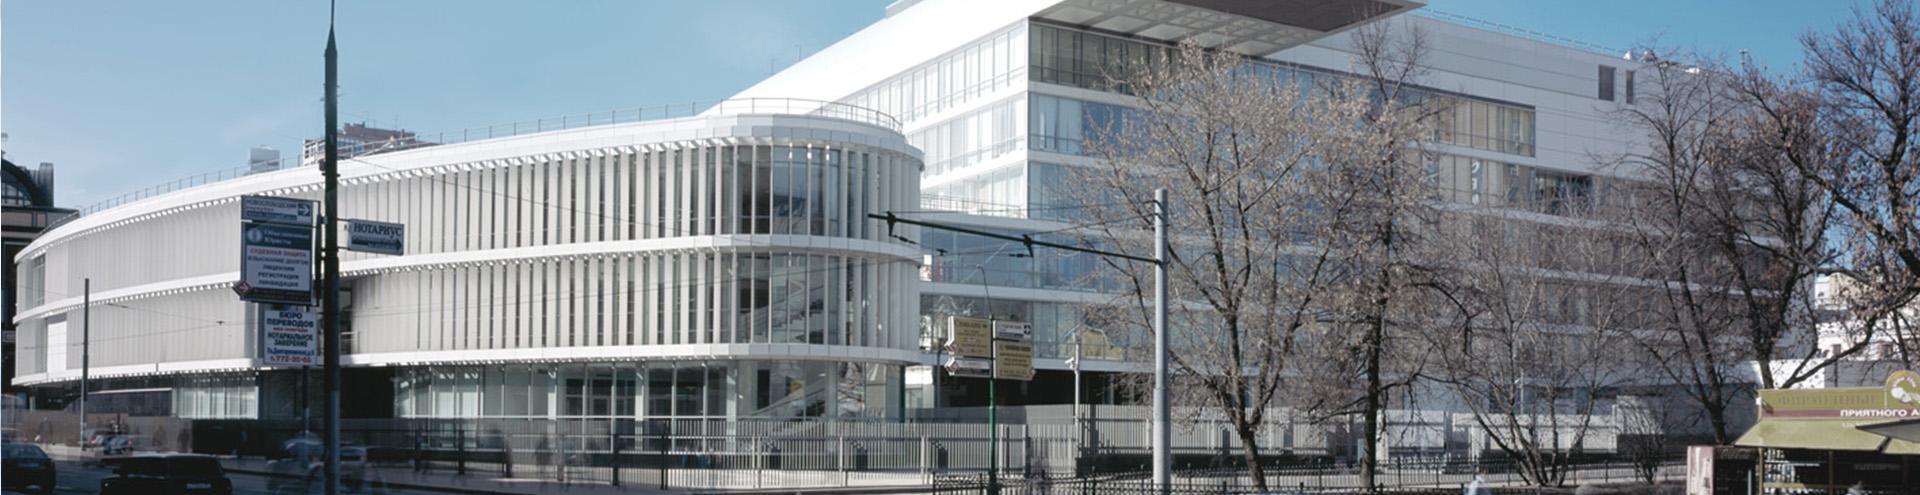 арбитражный суд Нижнего Новгорода